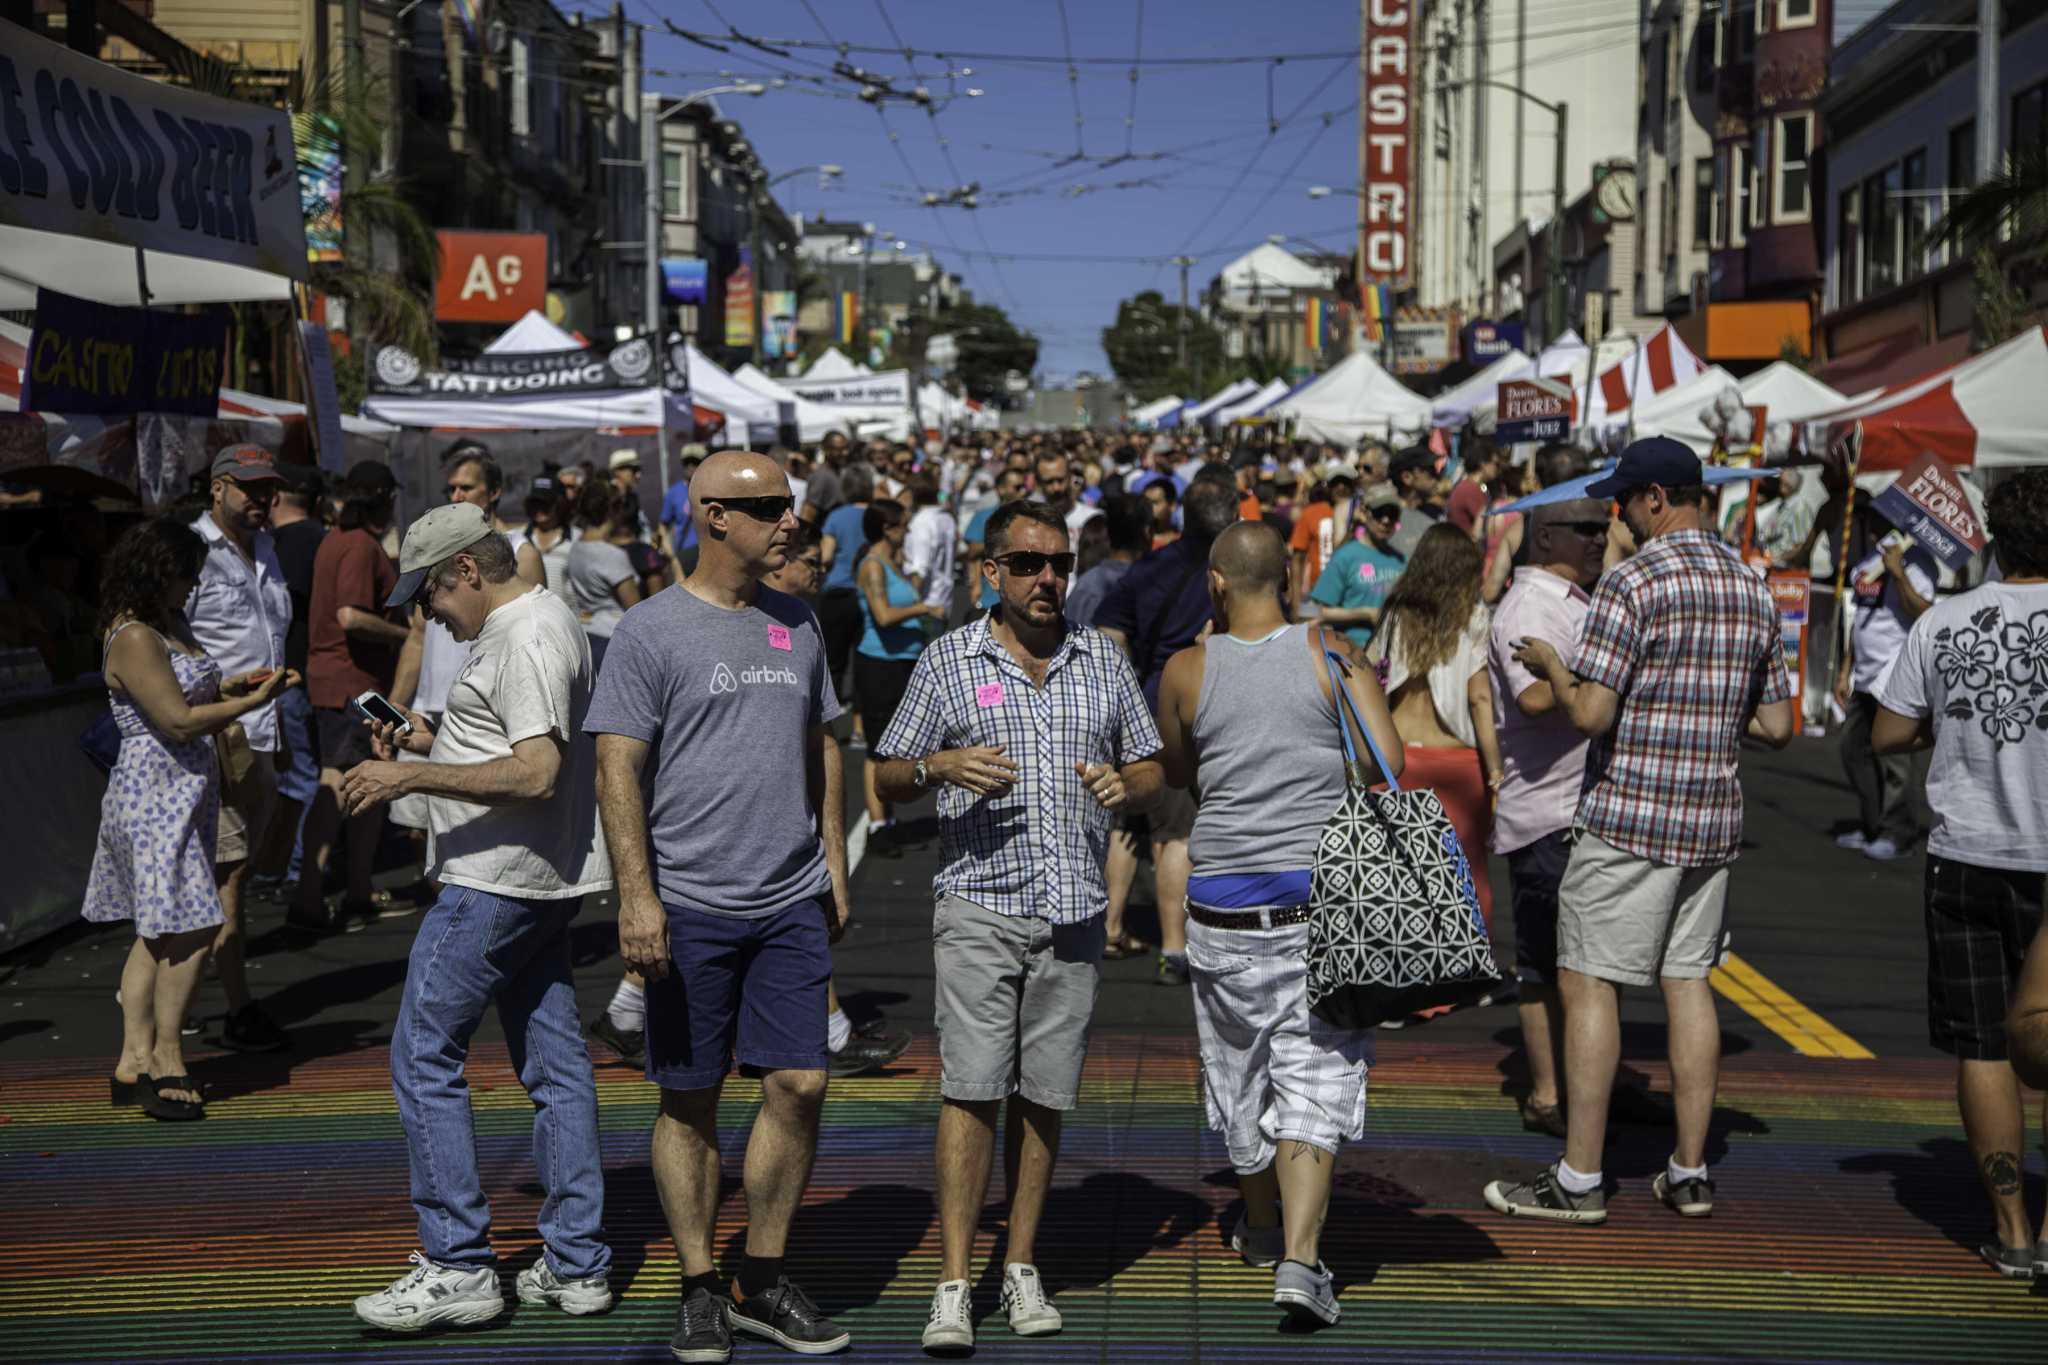 Fair attendees walk over the Castro neighborhood's newly installed rainbow crosswalk during the Castro Street Fair in San Francisco Sunday, Oct. 5, 2014.